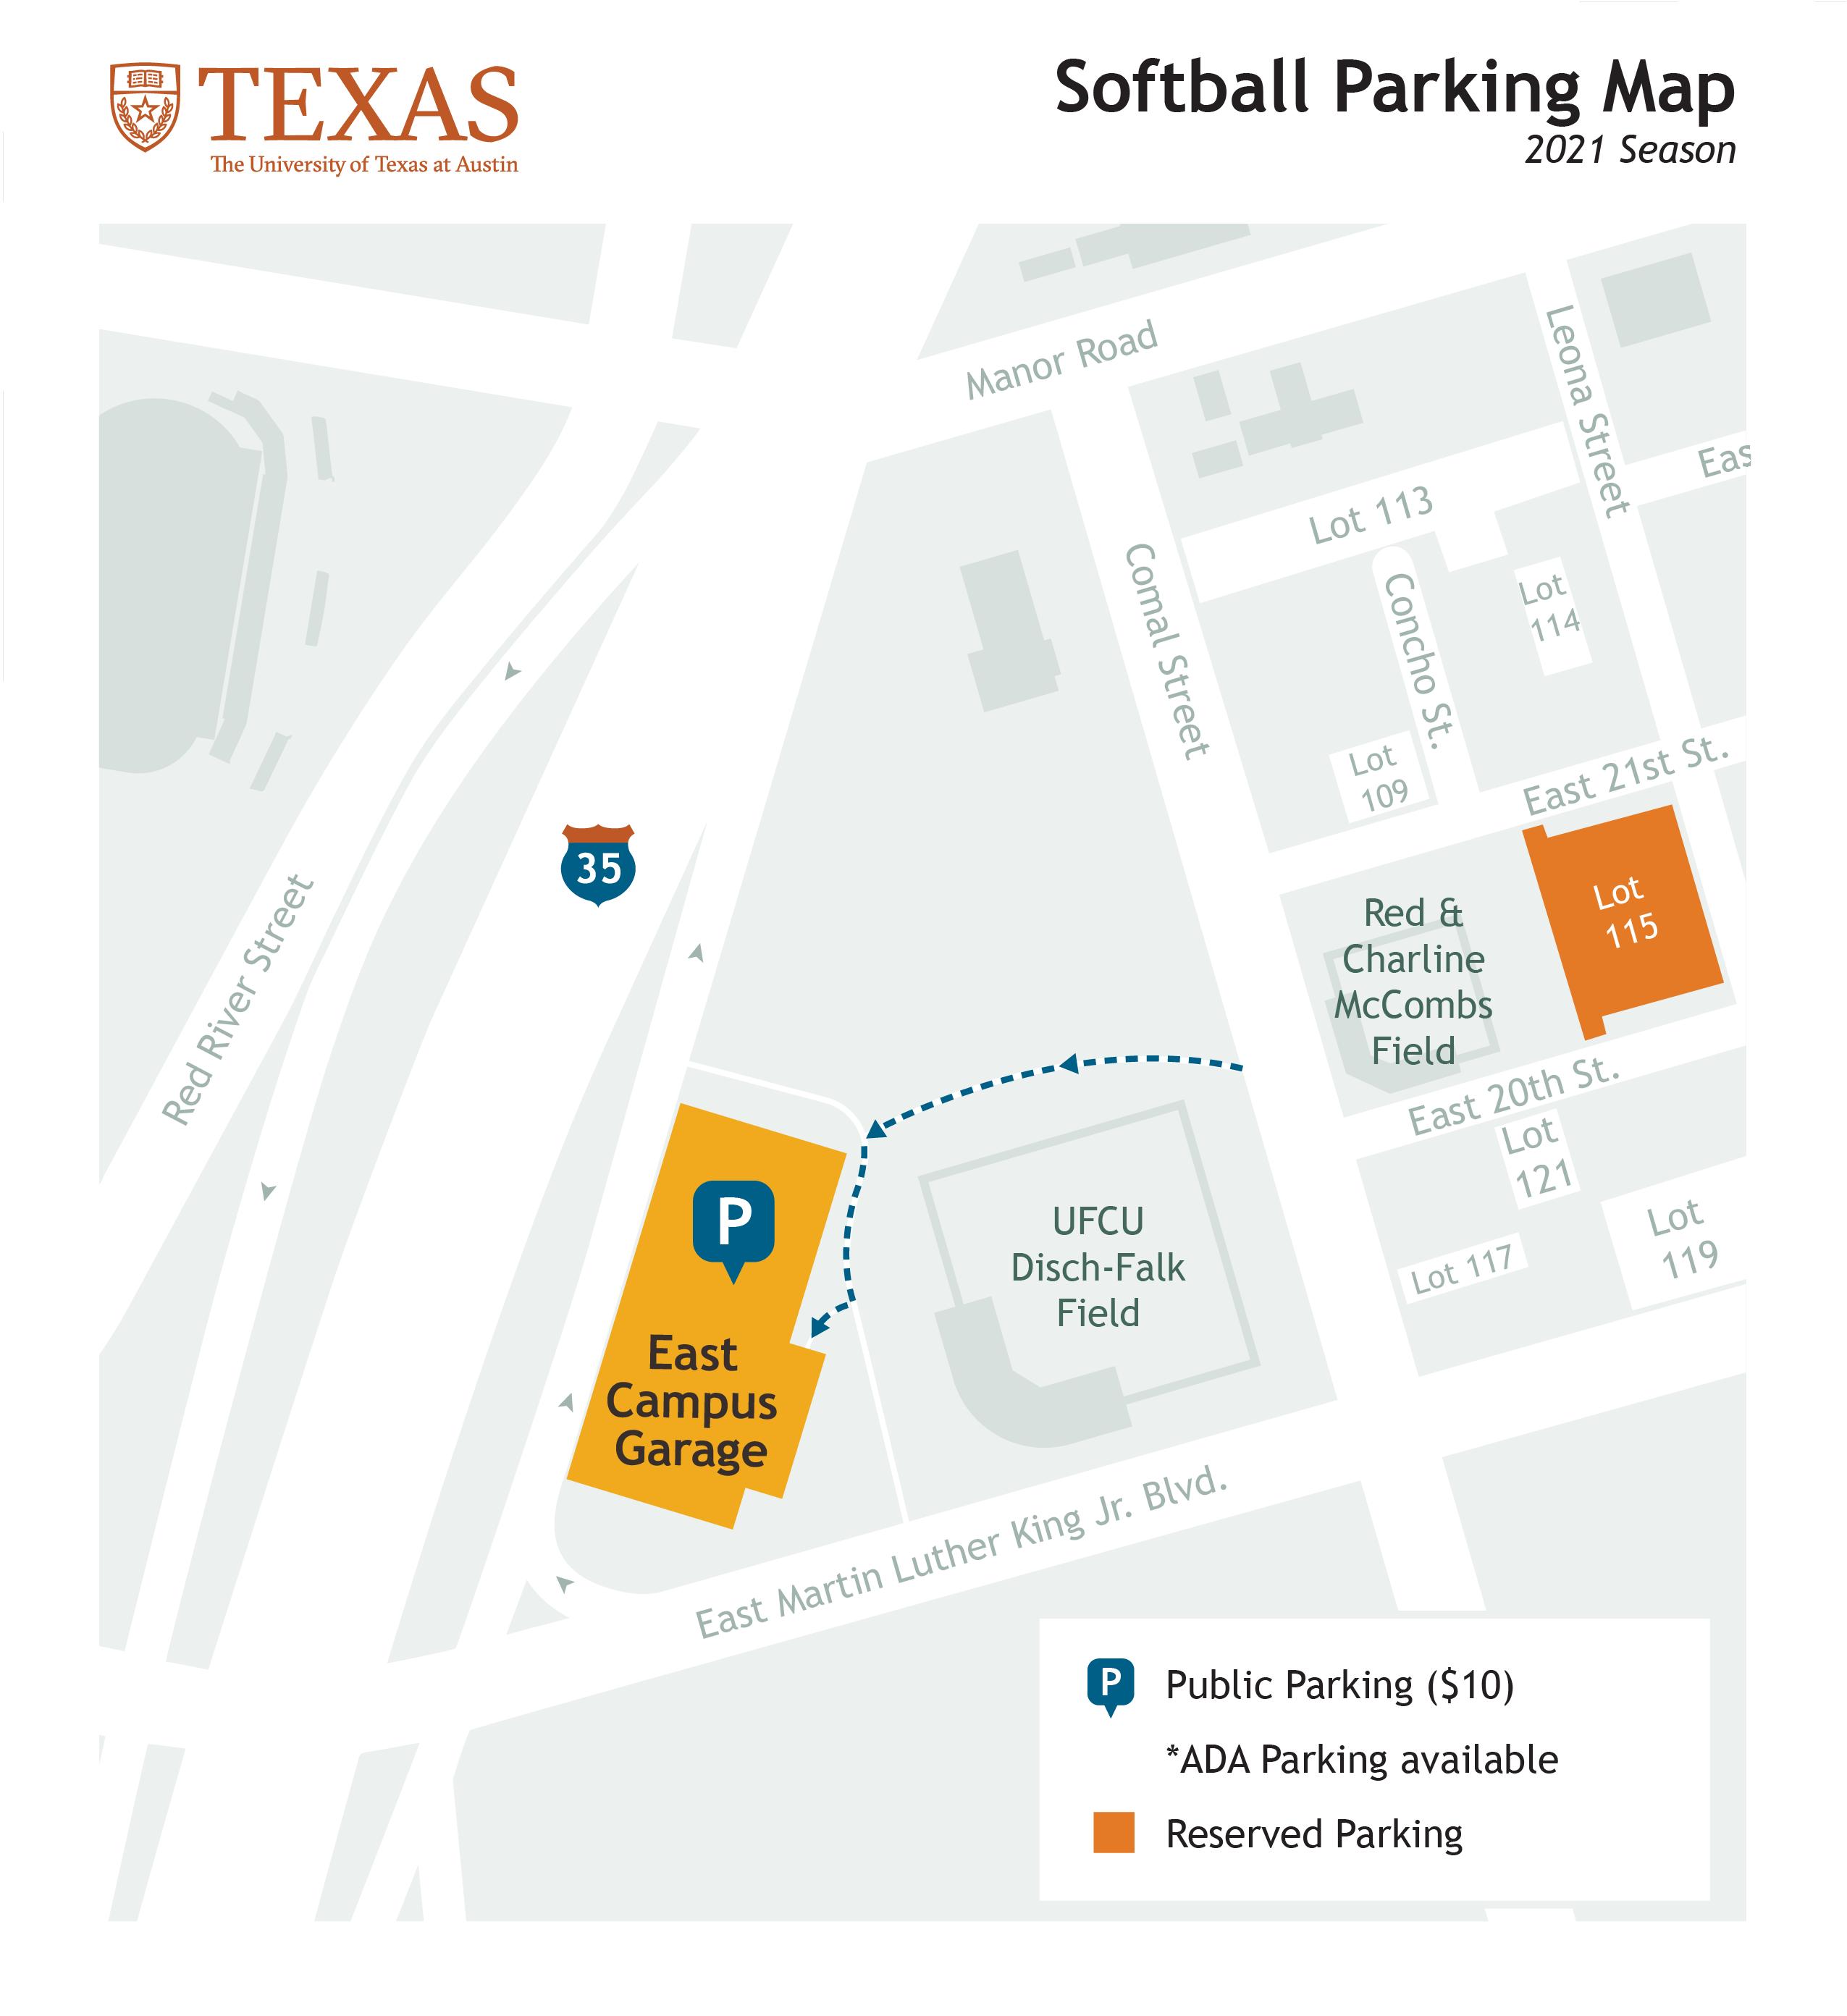 softball parking map 2021